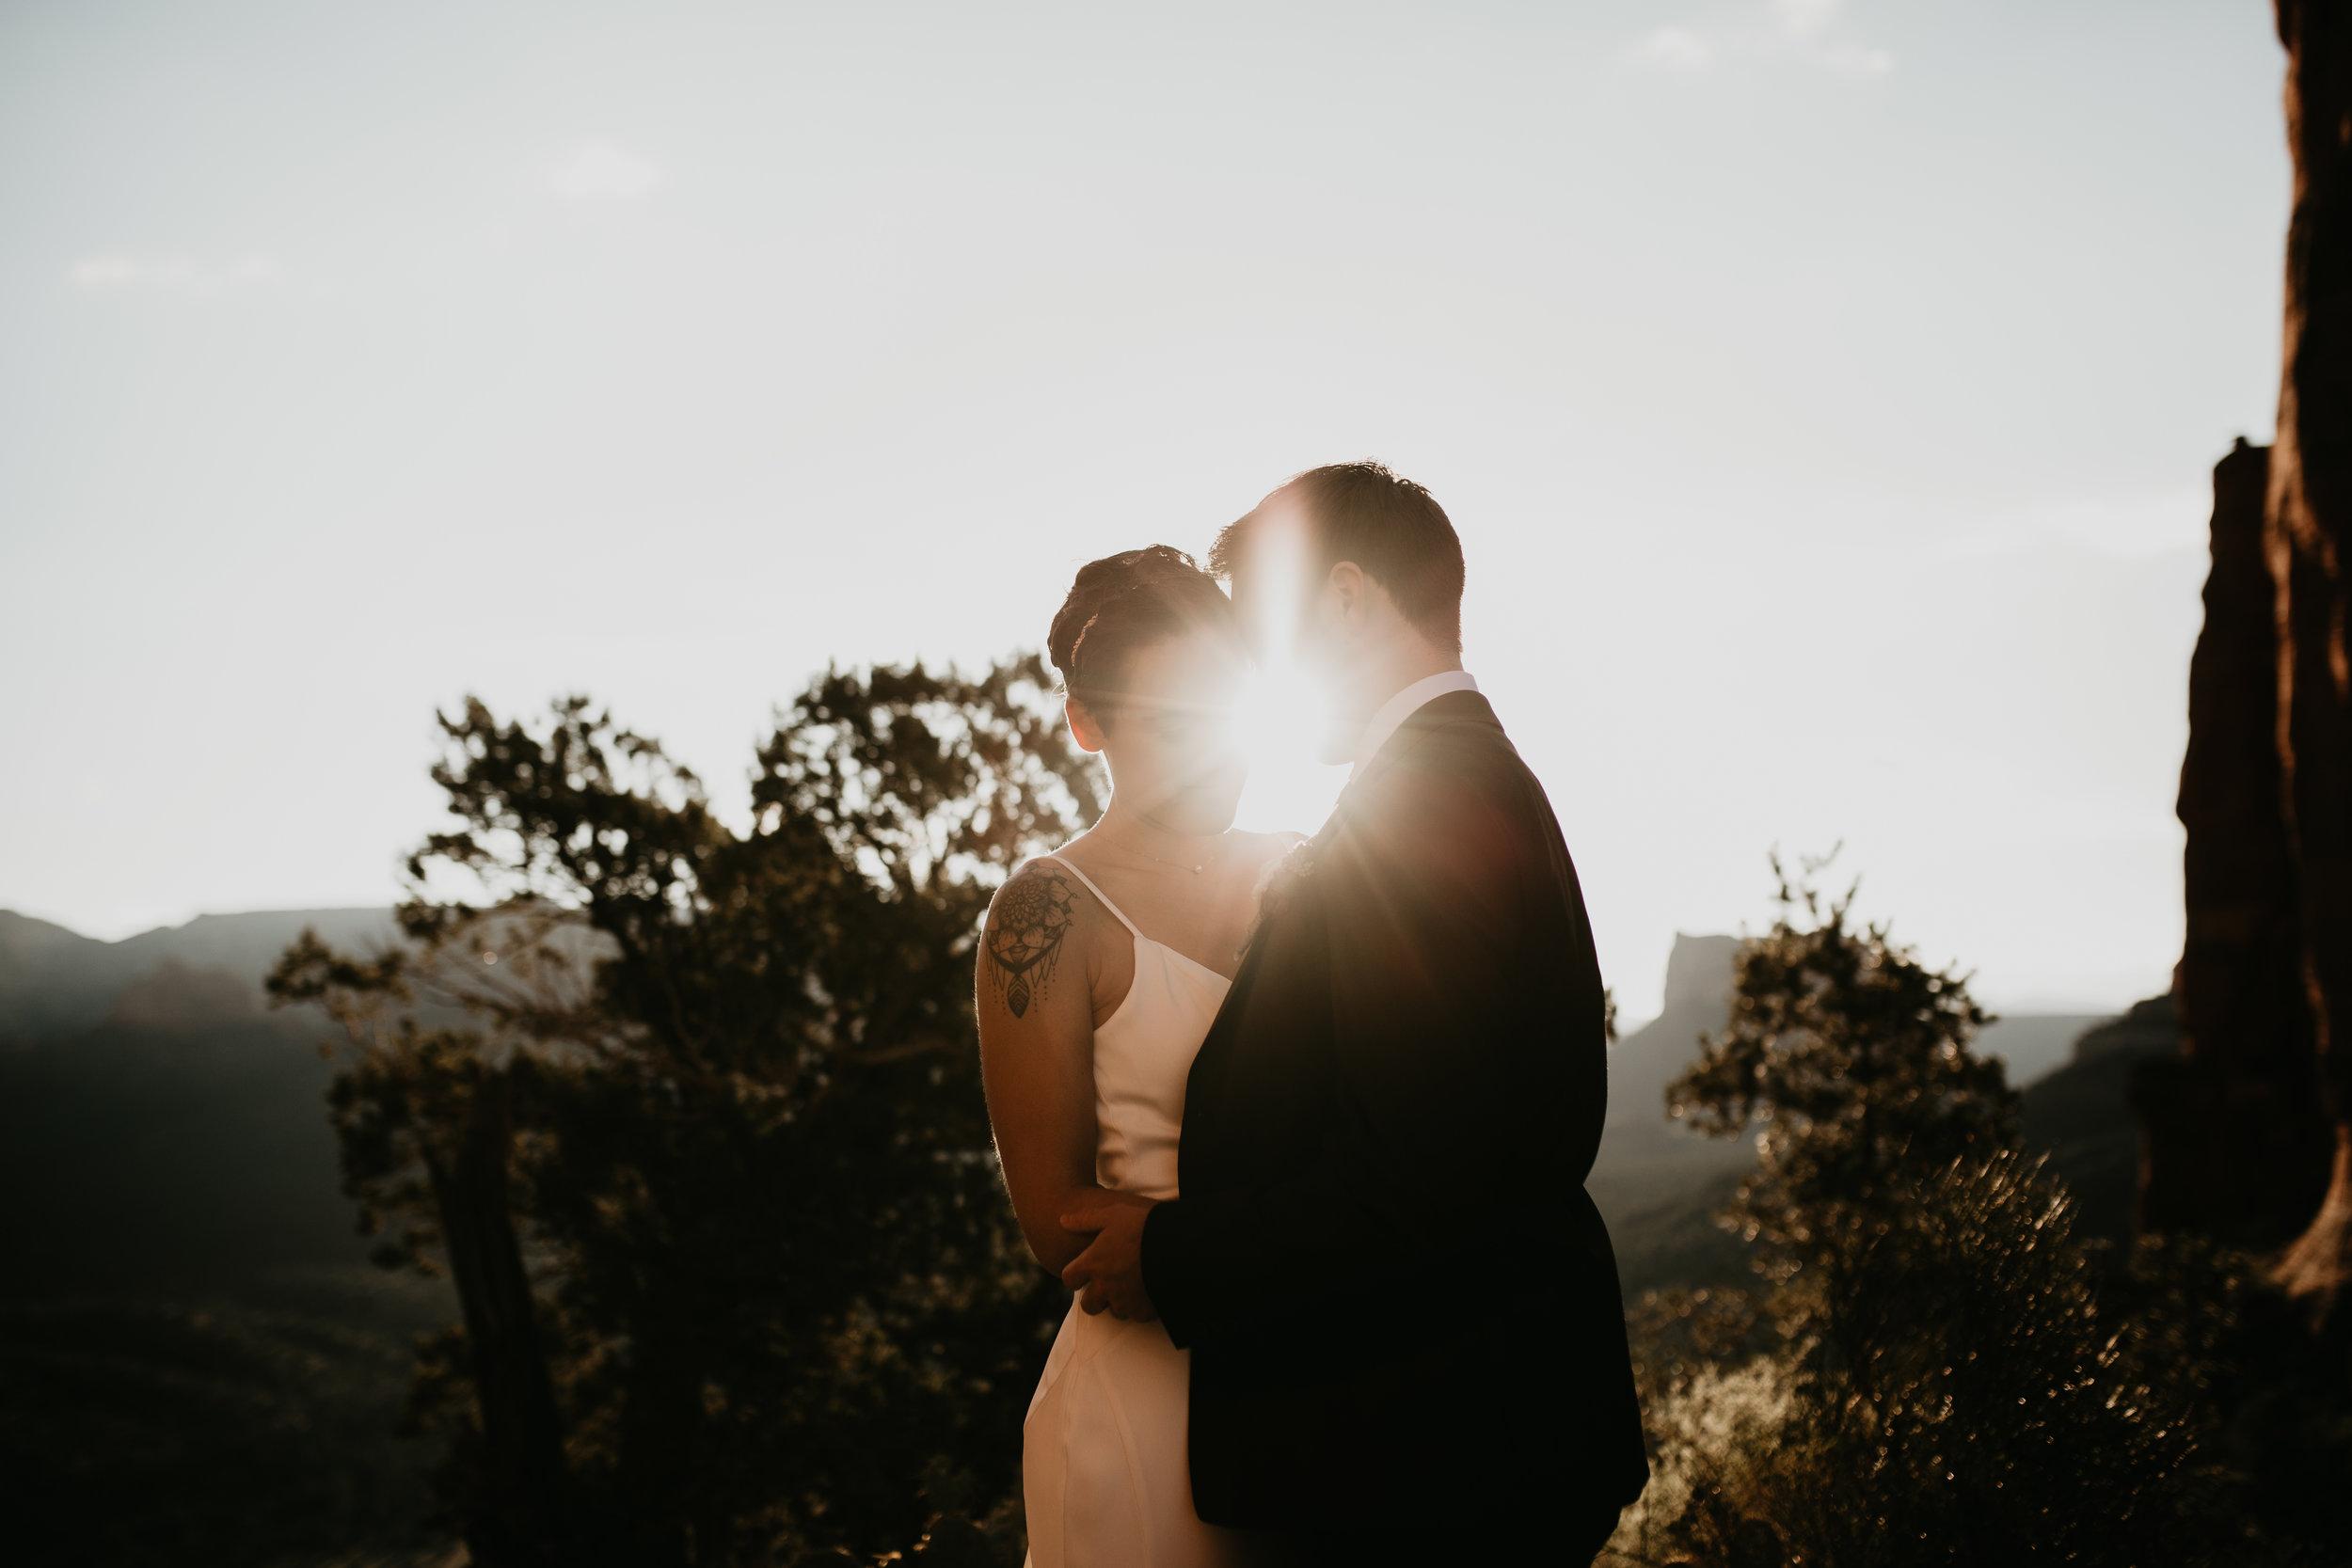 nicole-daacke-photography-sedona-arizona-destination-elopement-wedding-photographer-catherdral-rock-hiking-elopement-sedona-river-elopement-photos-desert-rock-wedding-photographer-laid-back-spontaneous-elopement-59.jpg